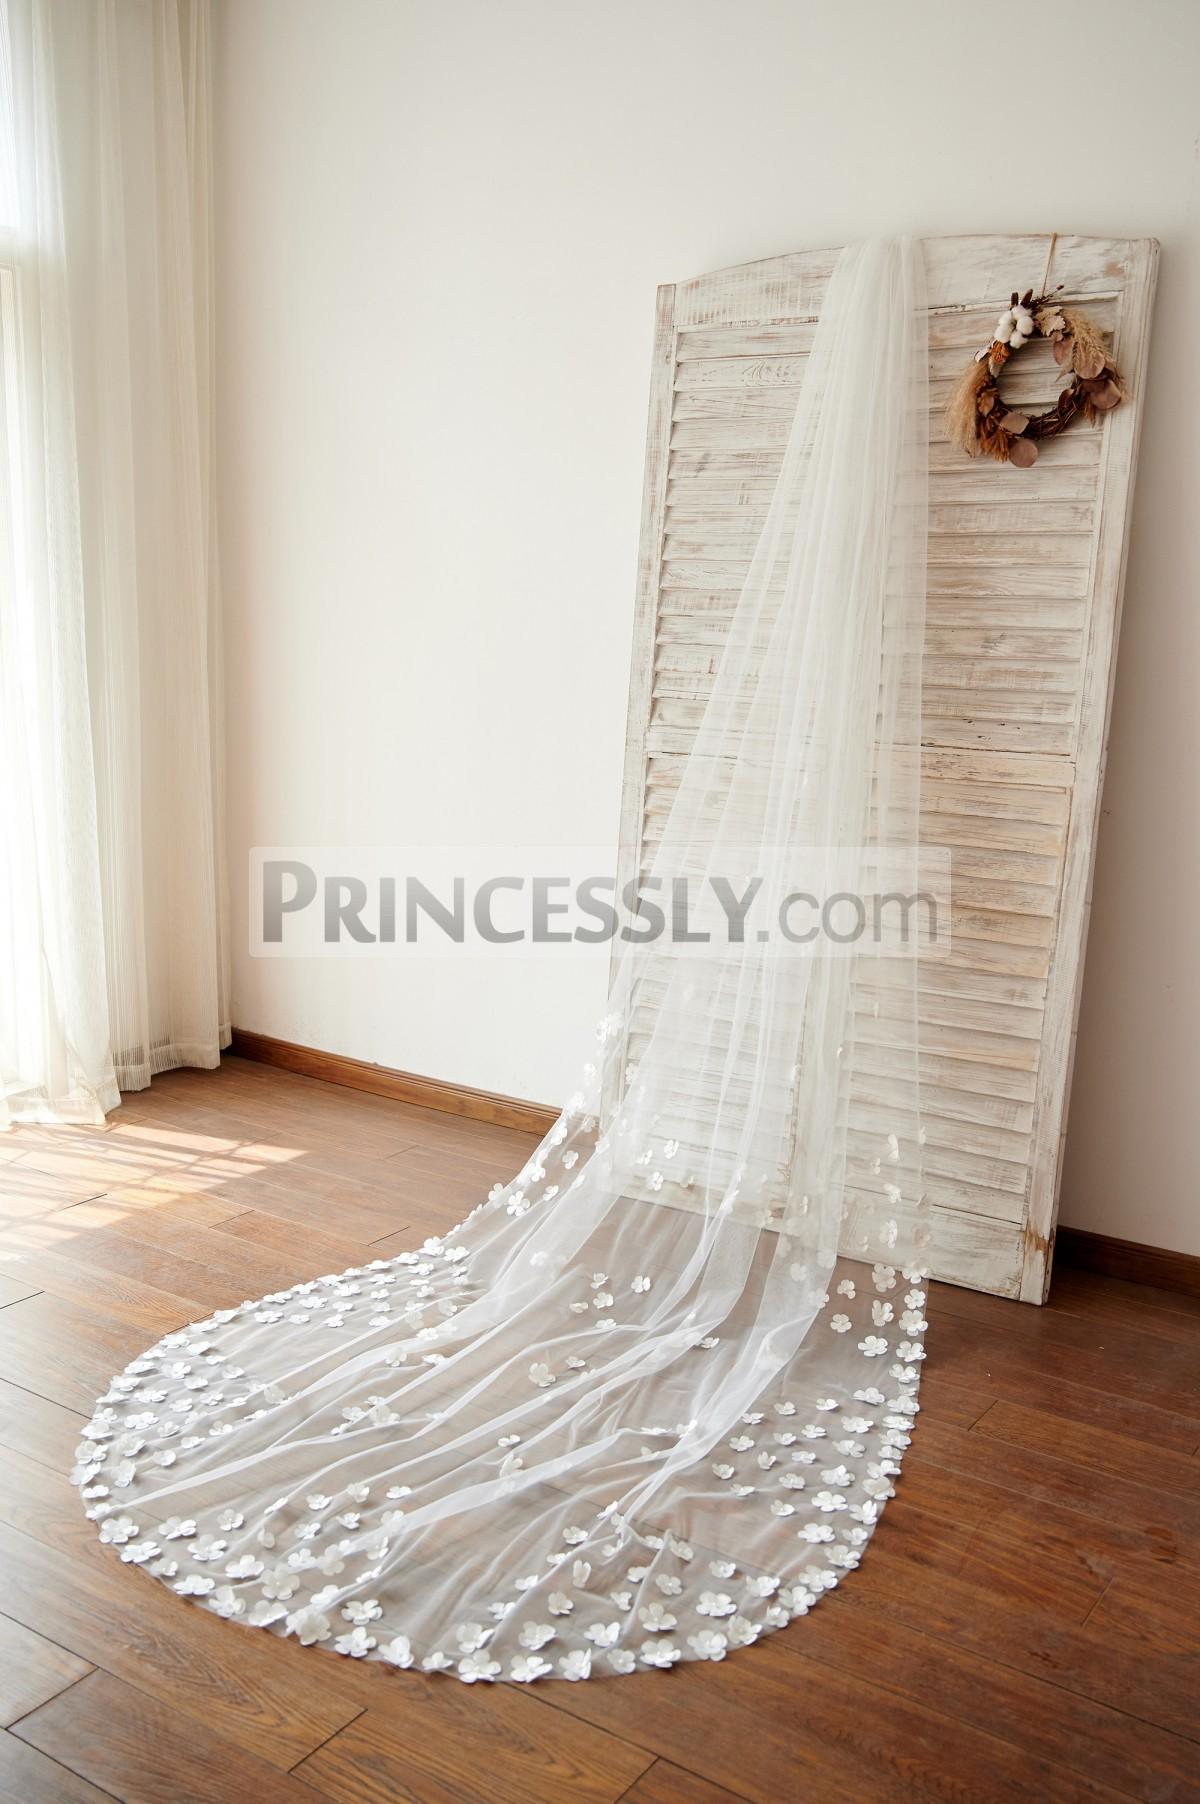 Princessly.com-K1003976-Handmade Flowers 3M Long Cathedral Wedding Bridal Veil-31